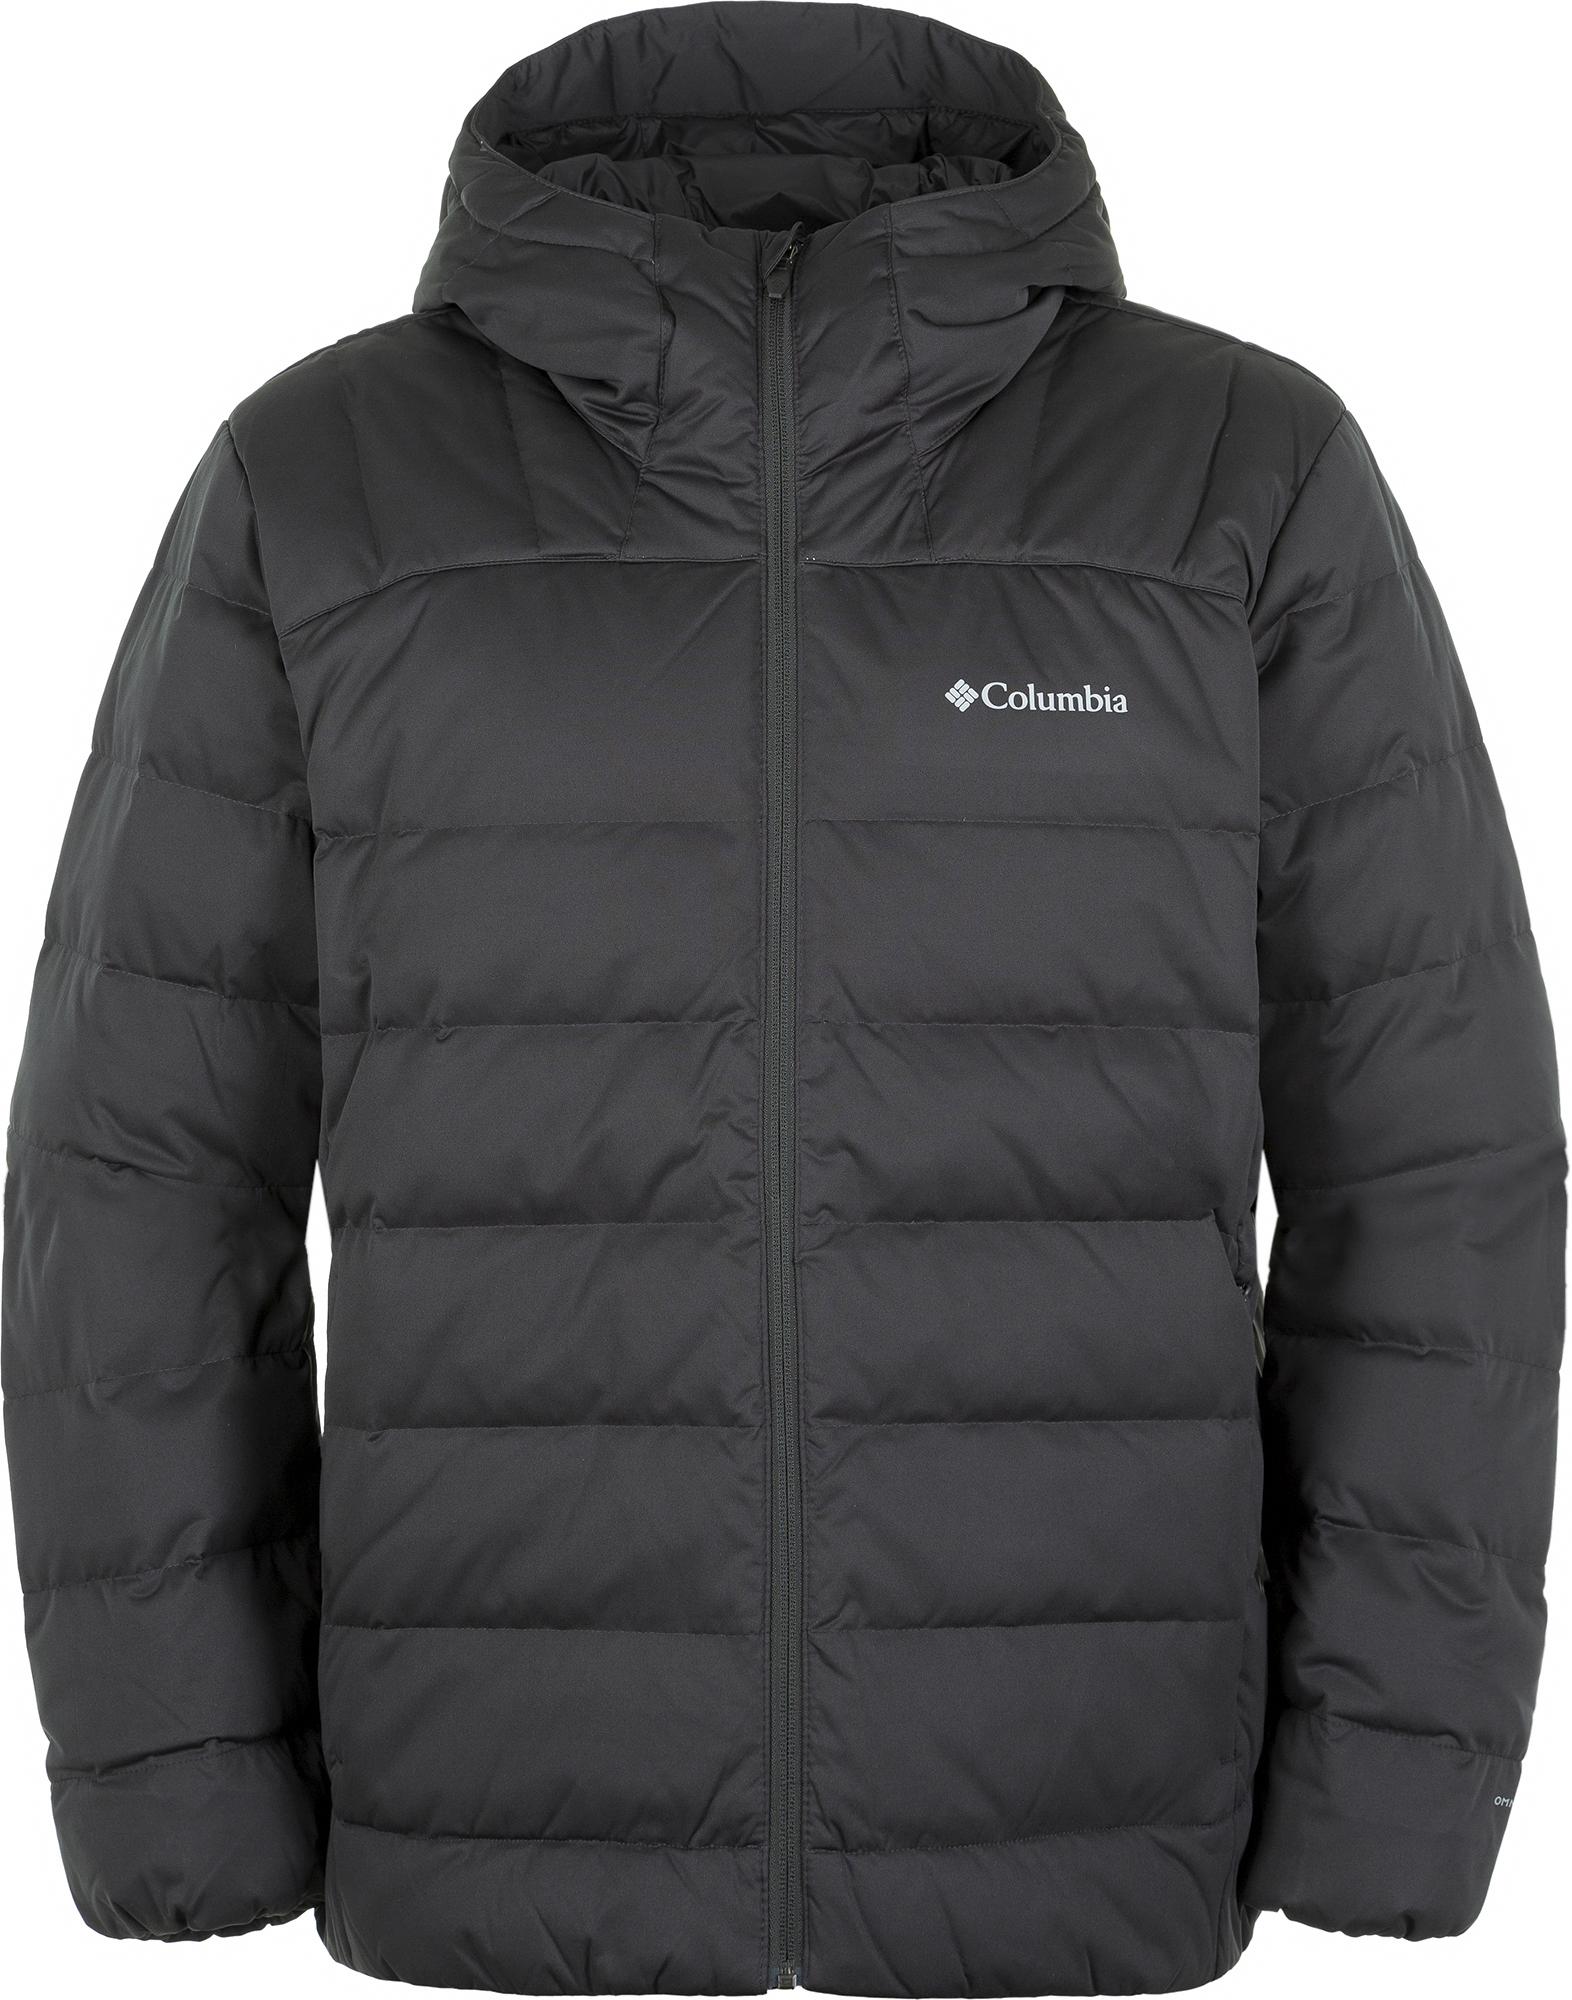 Columbia Куртка пуховая мужская Columbia Wrightson Peak II, размер 52-54 цена